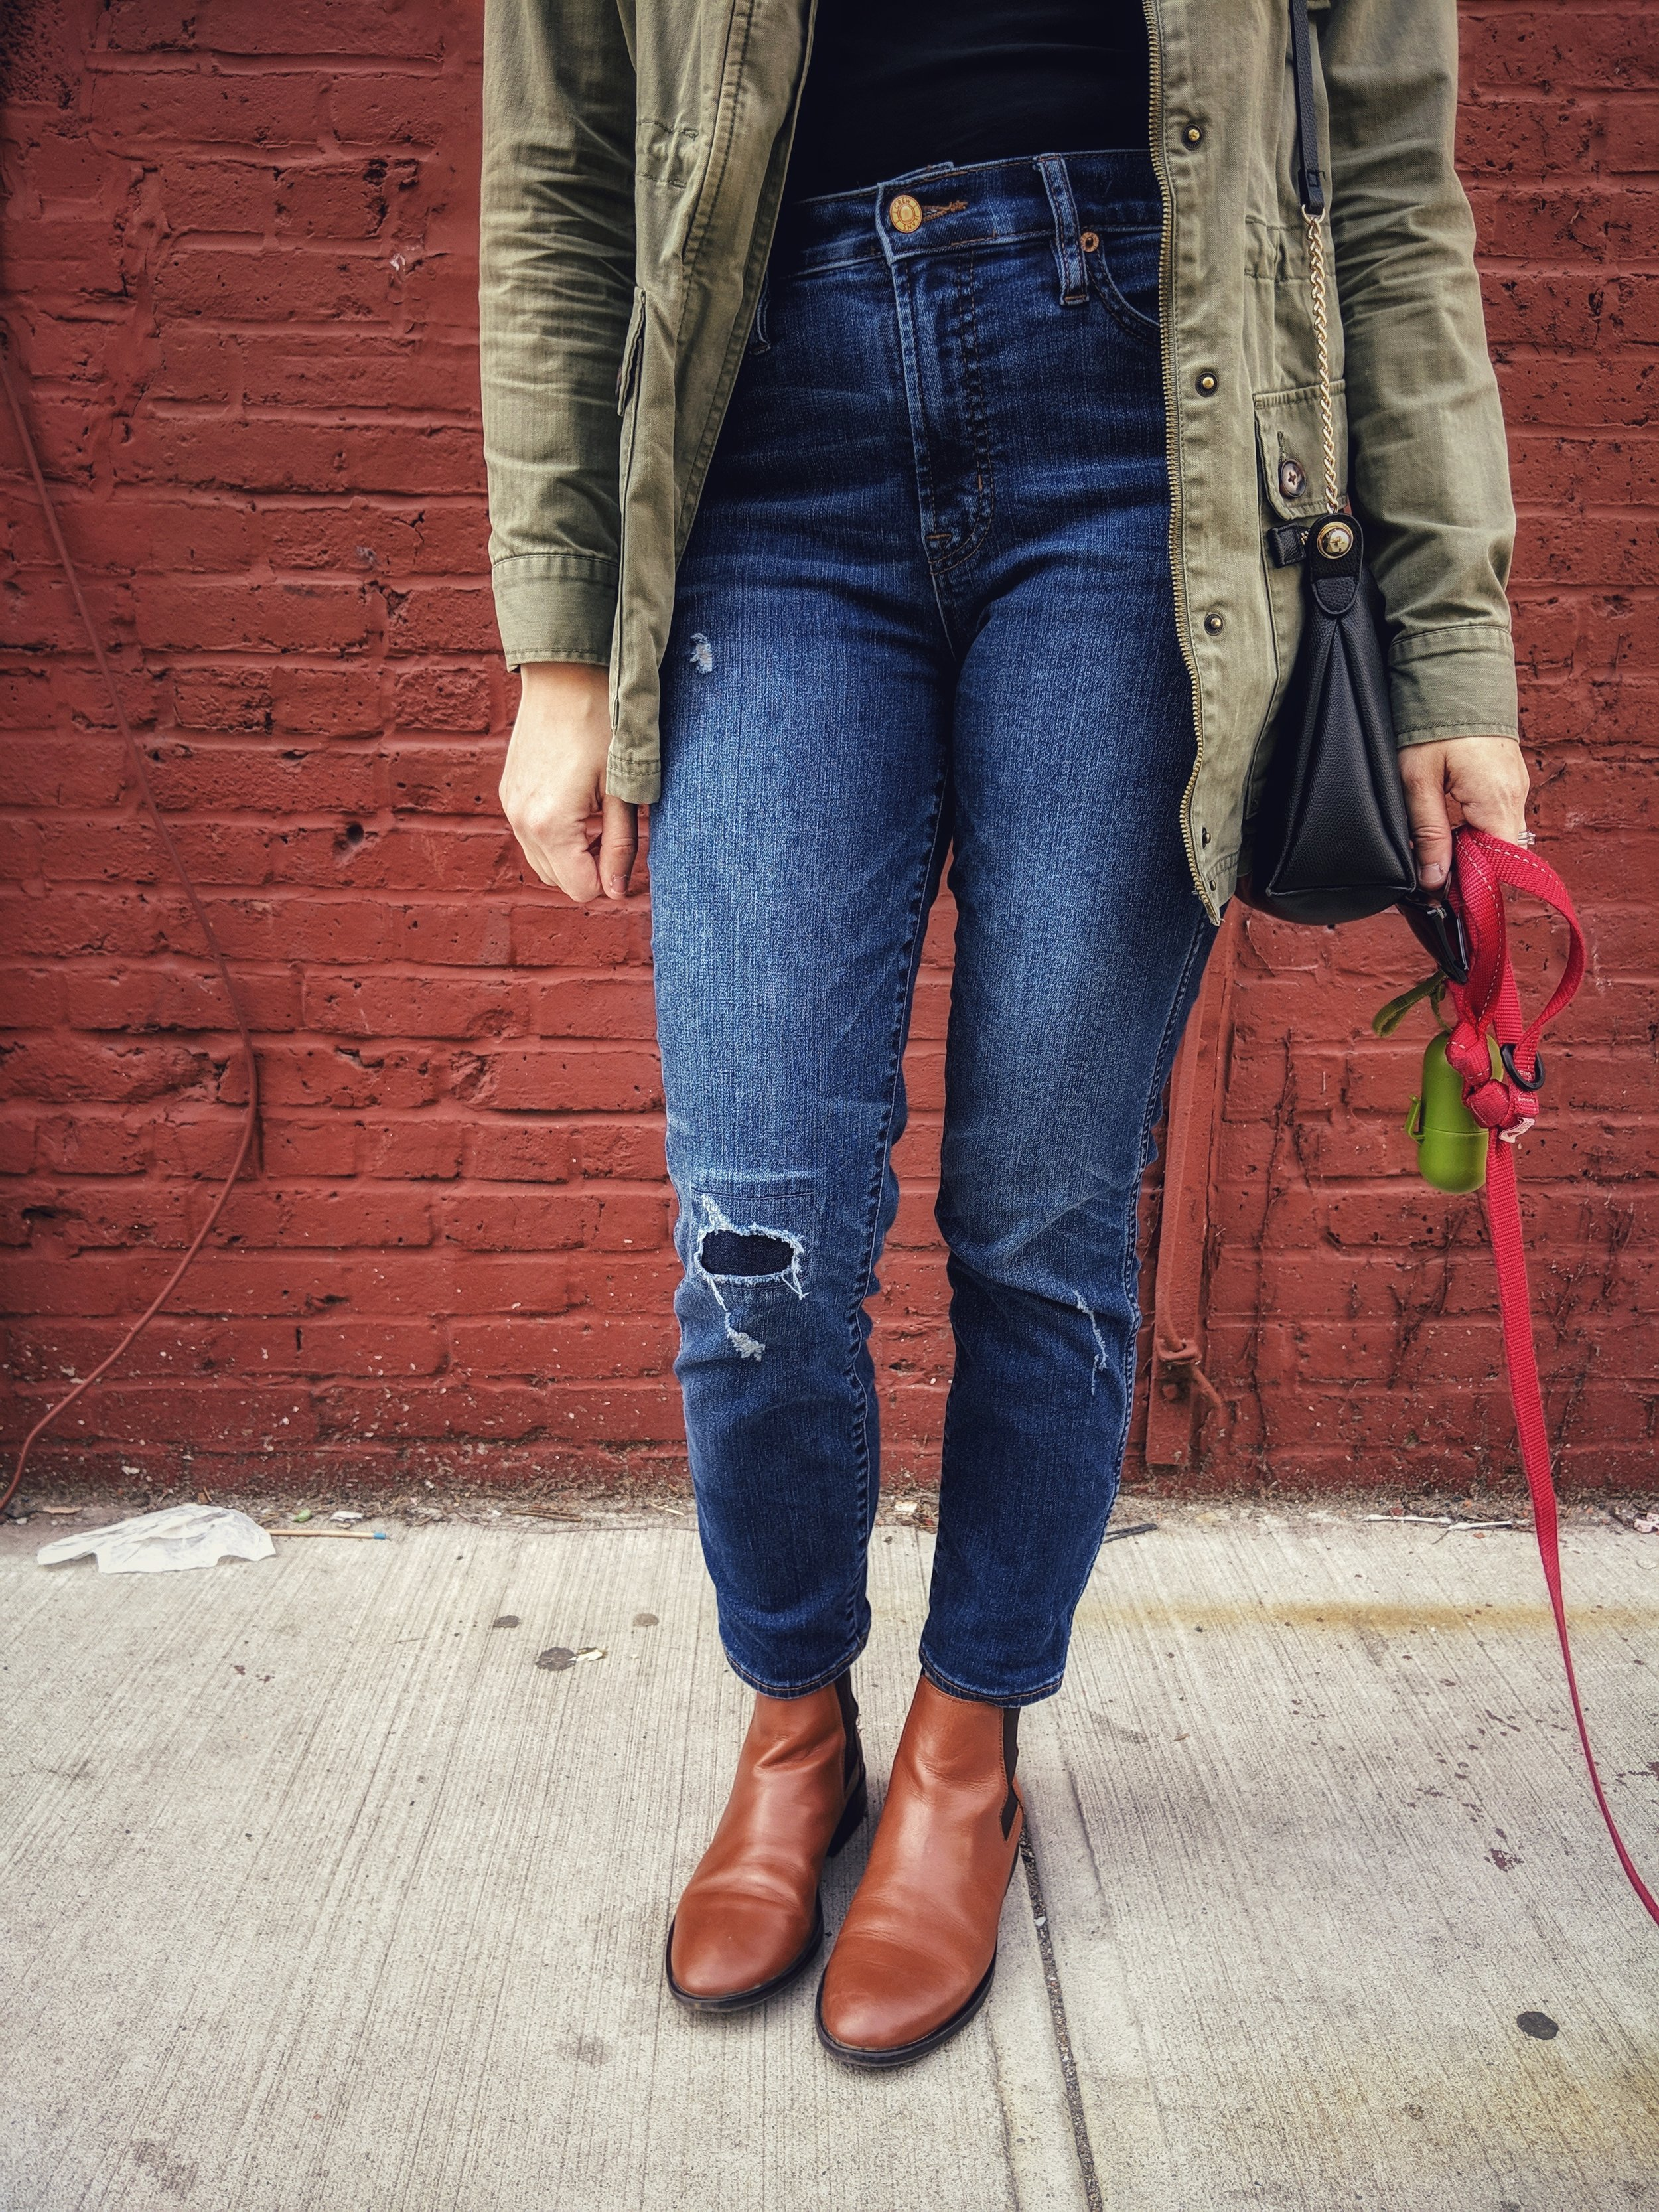 jcrew jeans asos boots.jpeg